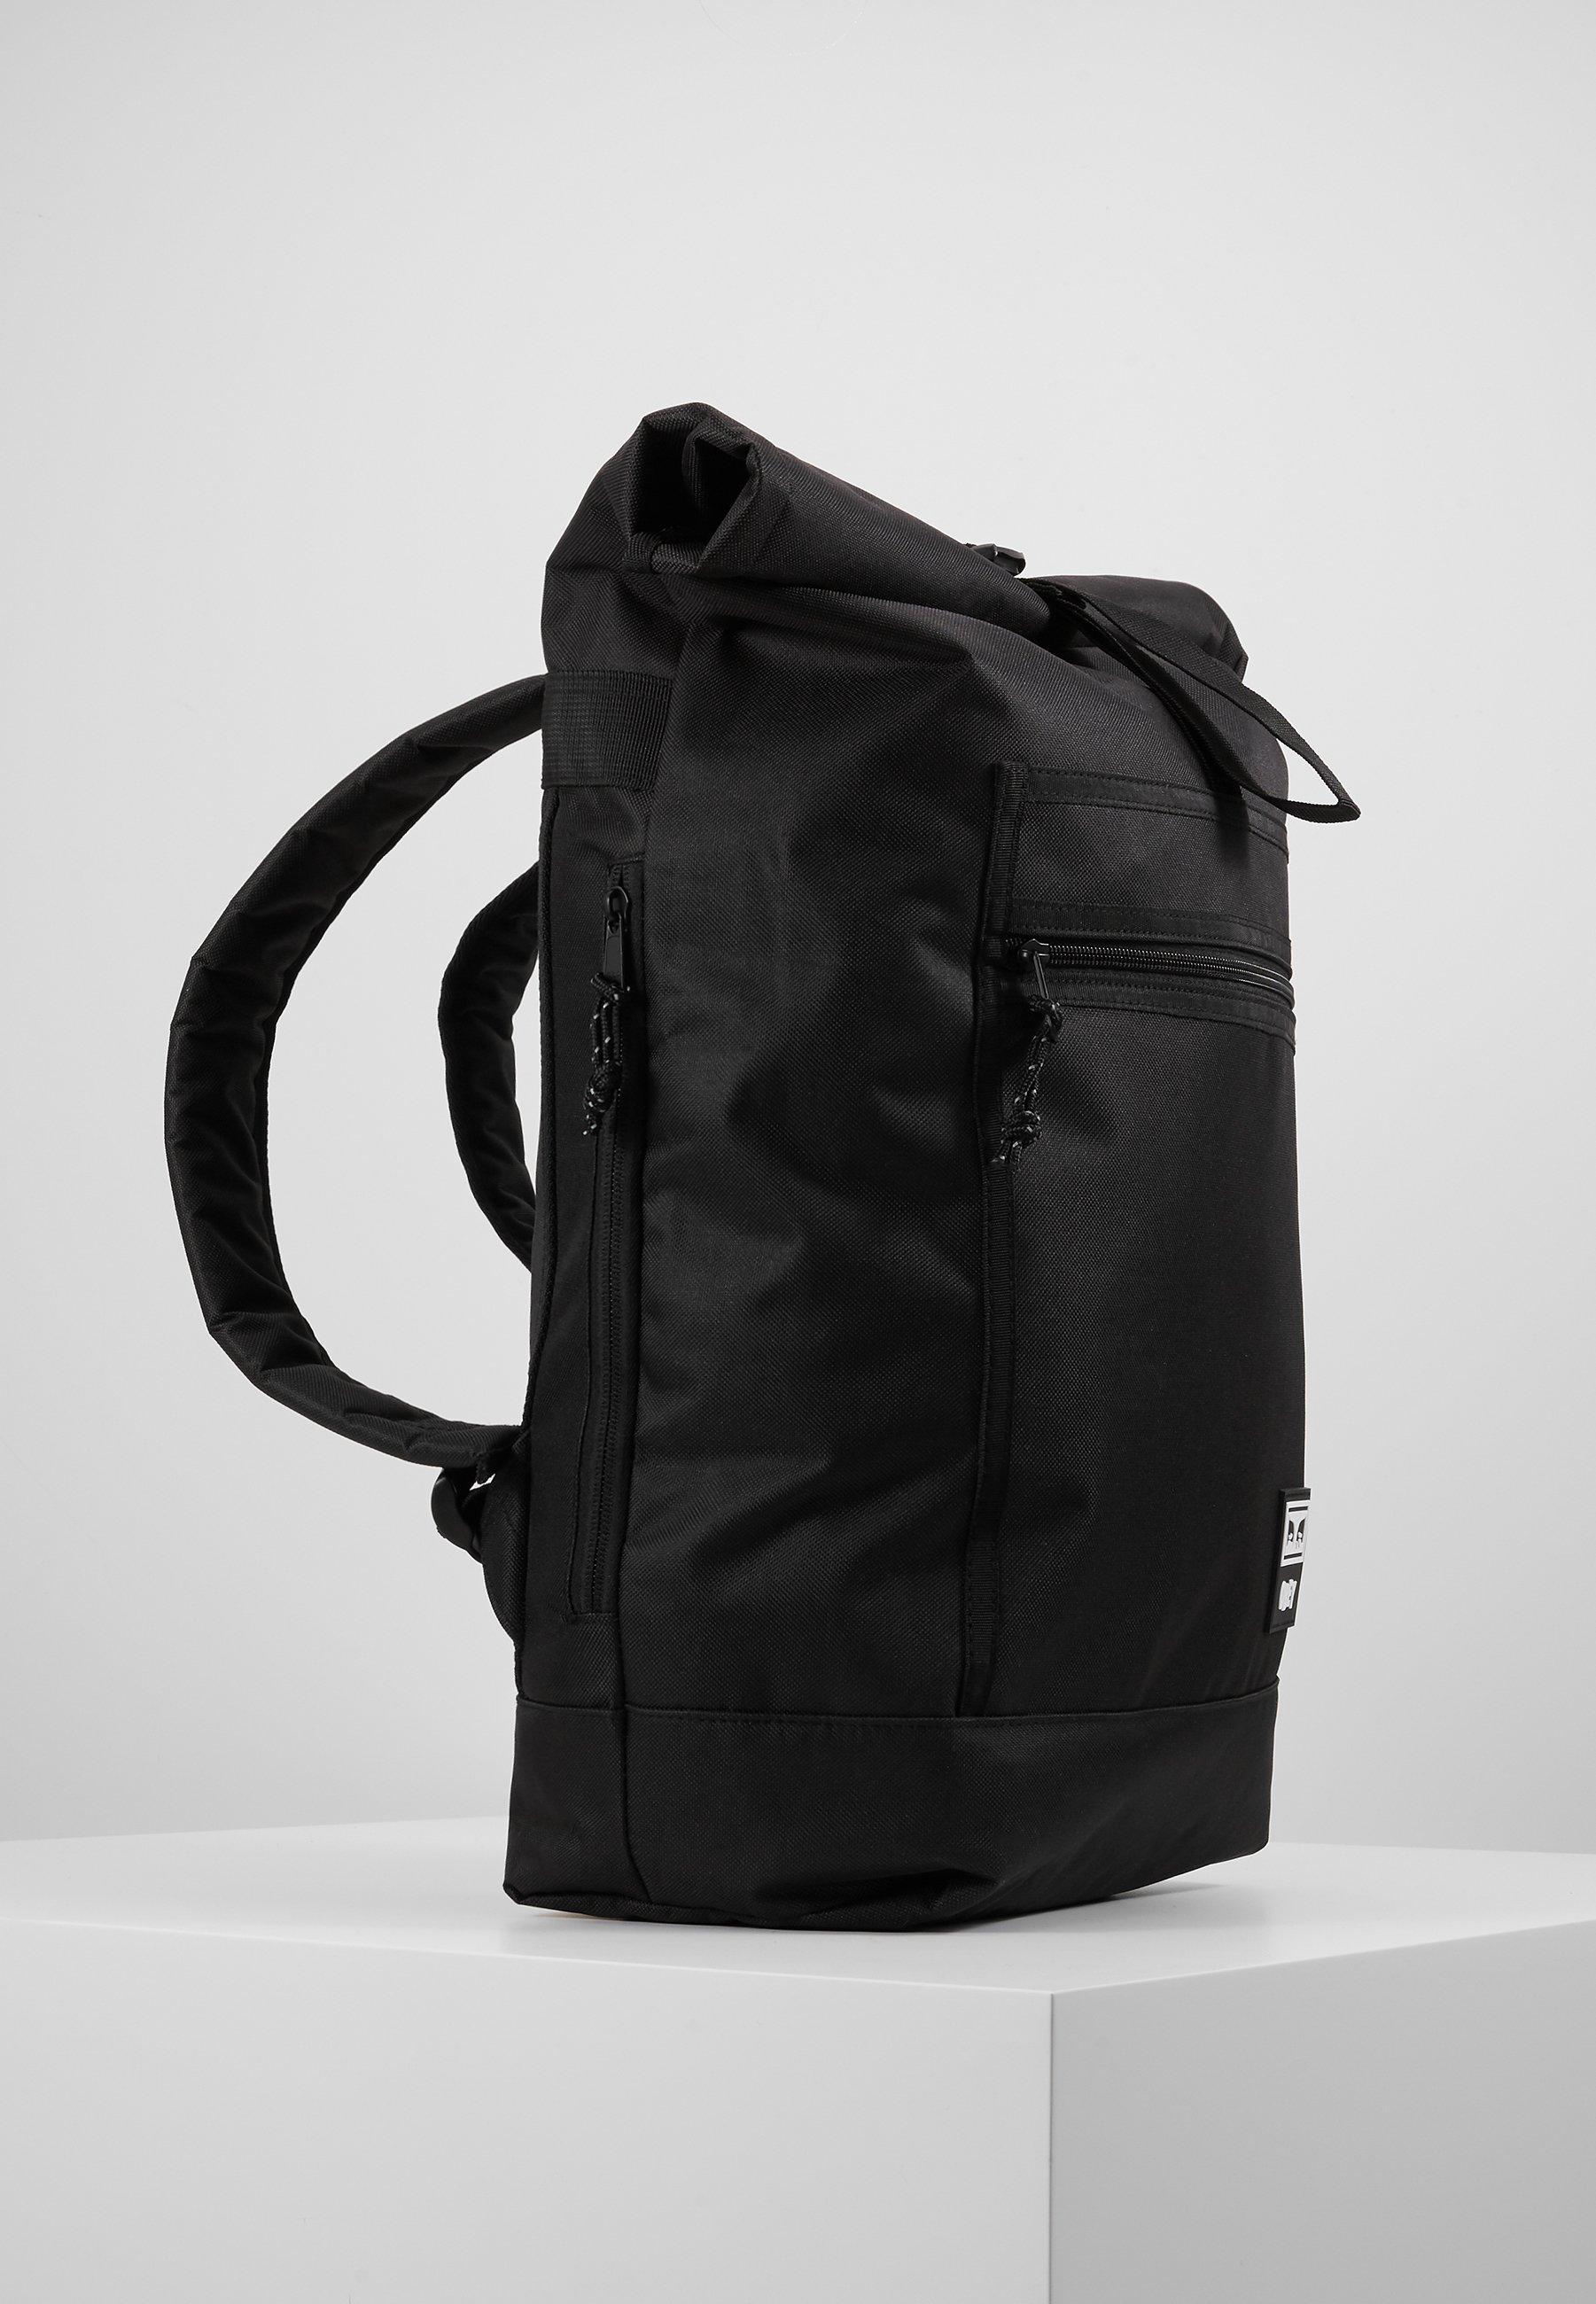 Obey Clothing CONDITIONS ROLL TOP BAG - Tagesrucksack - black/schwarz - Herrentaschen Rjh8f